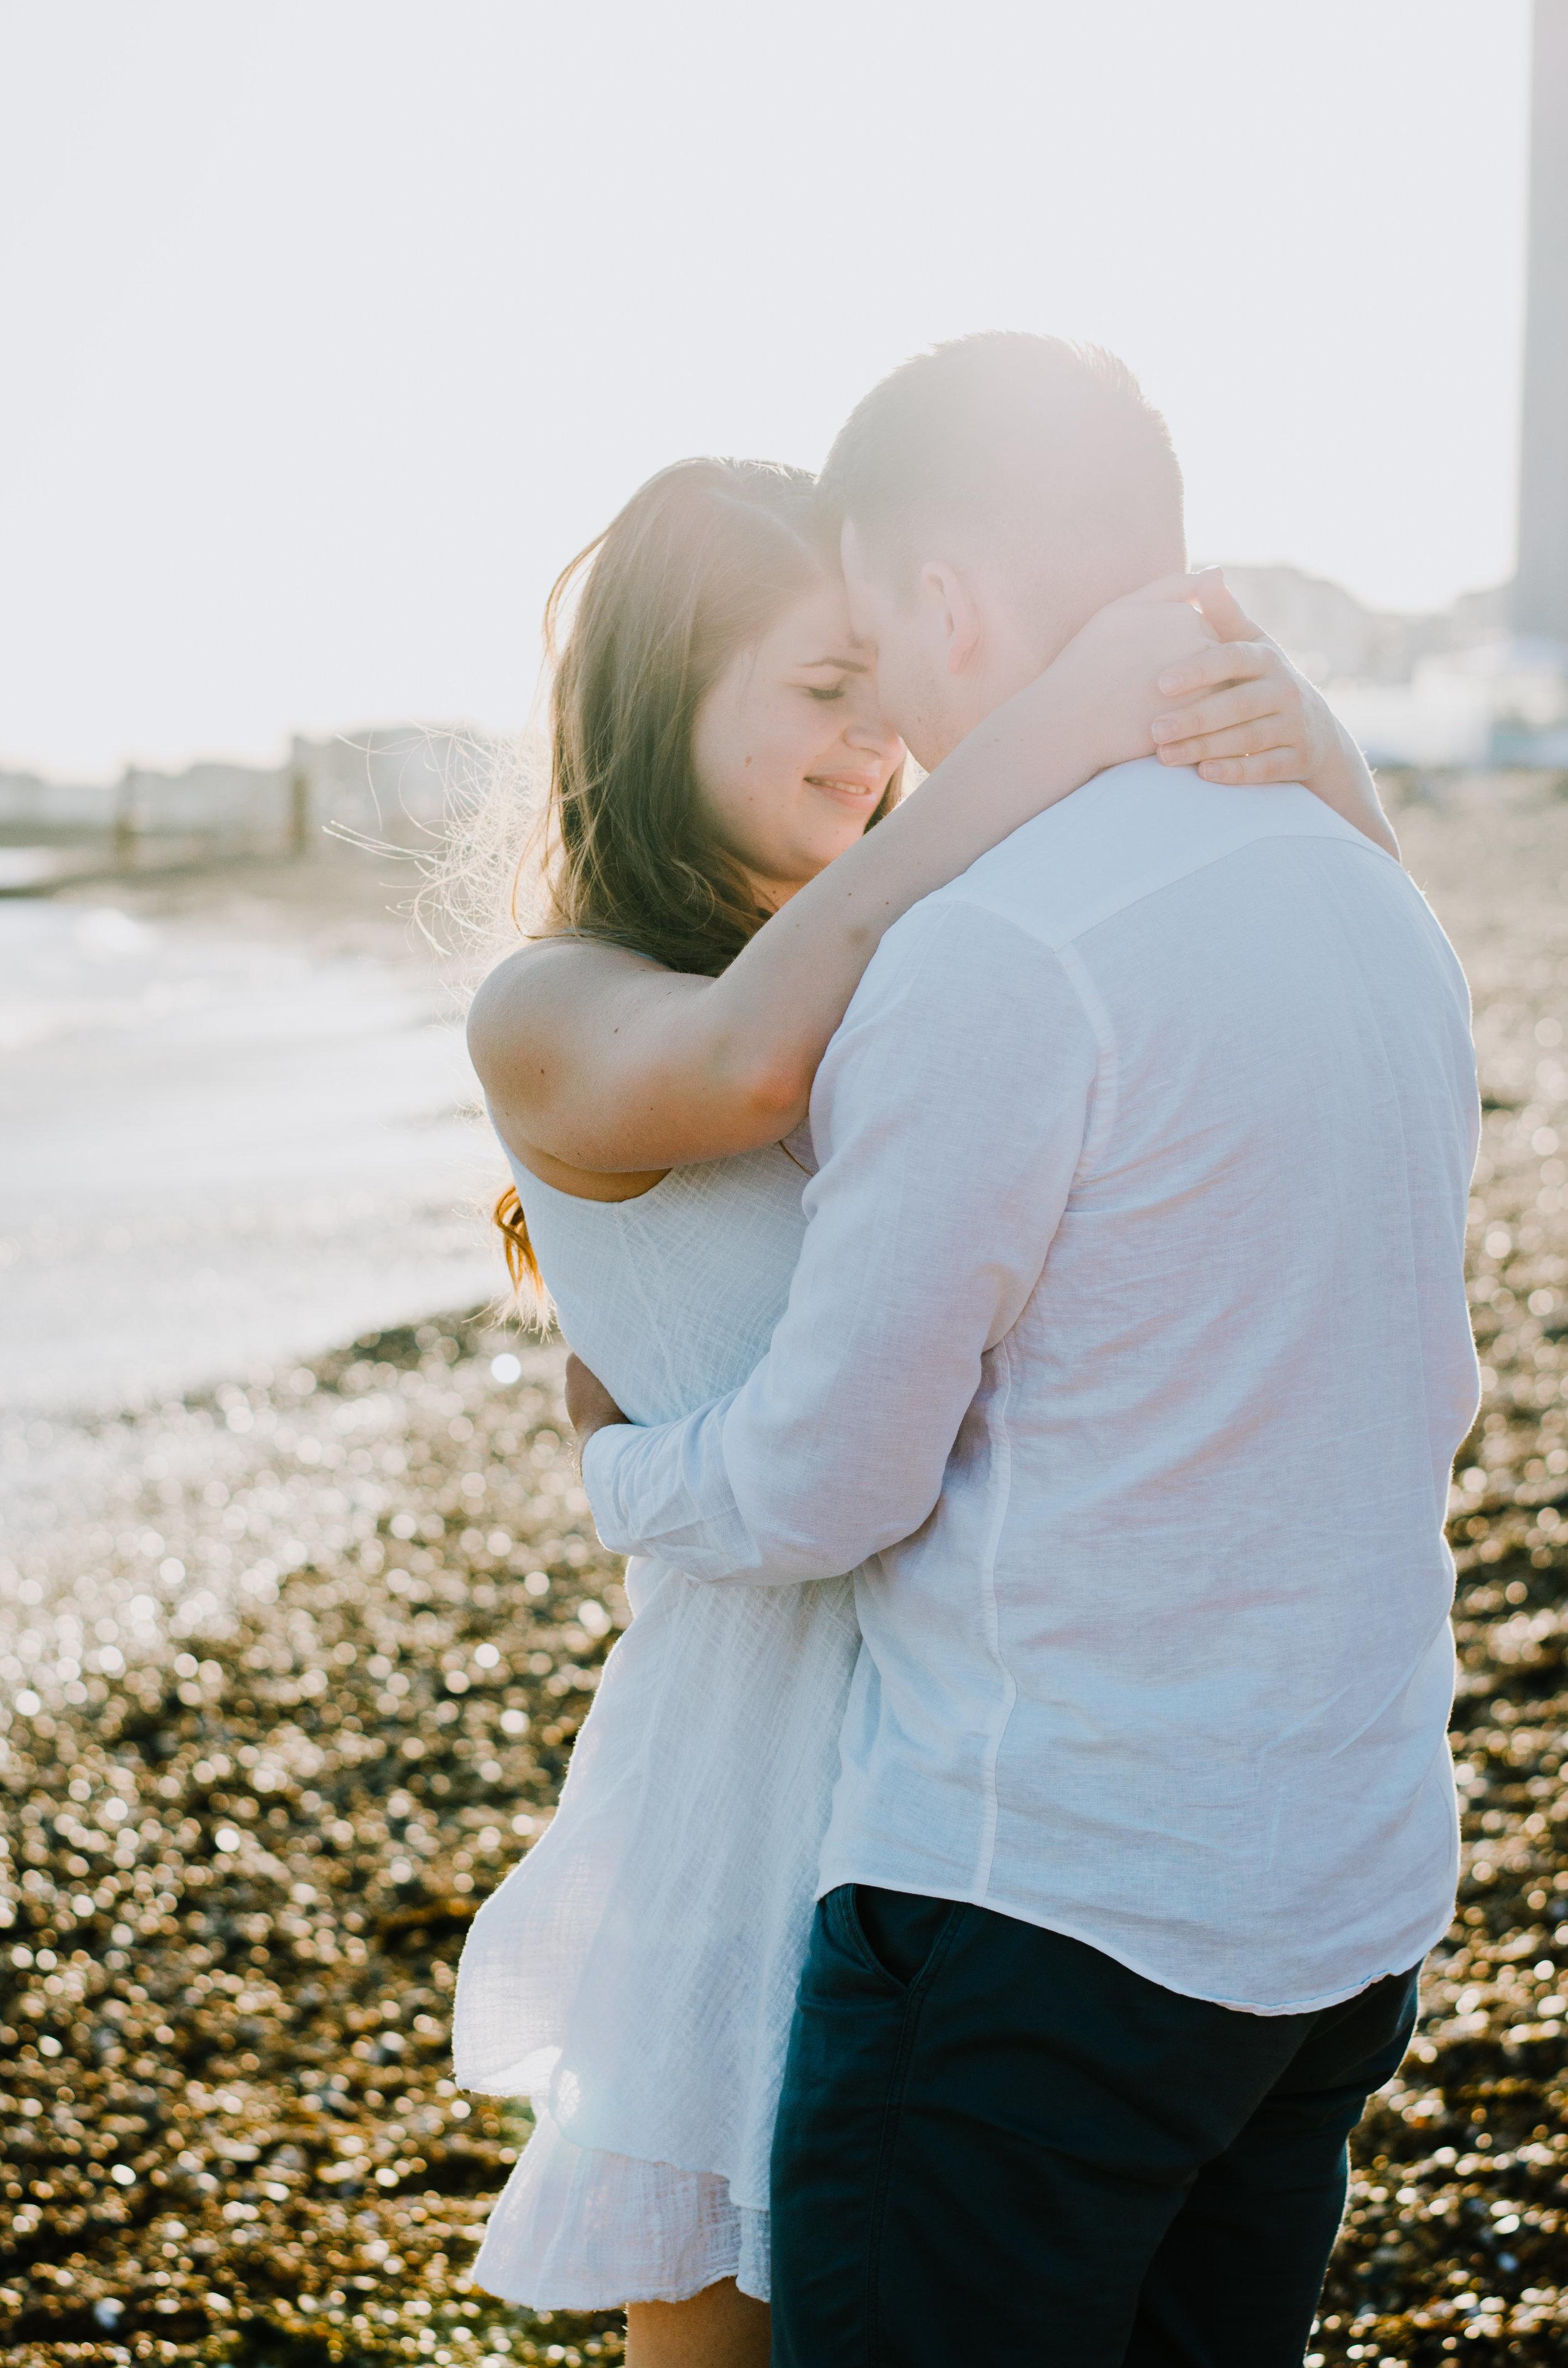 Ieva & Julius - Brighton Beach - Couple Session - Aiste Saulyte Photography-3.jpg